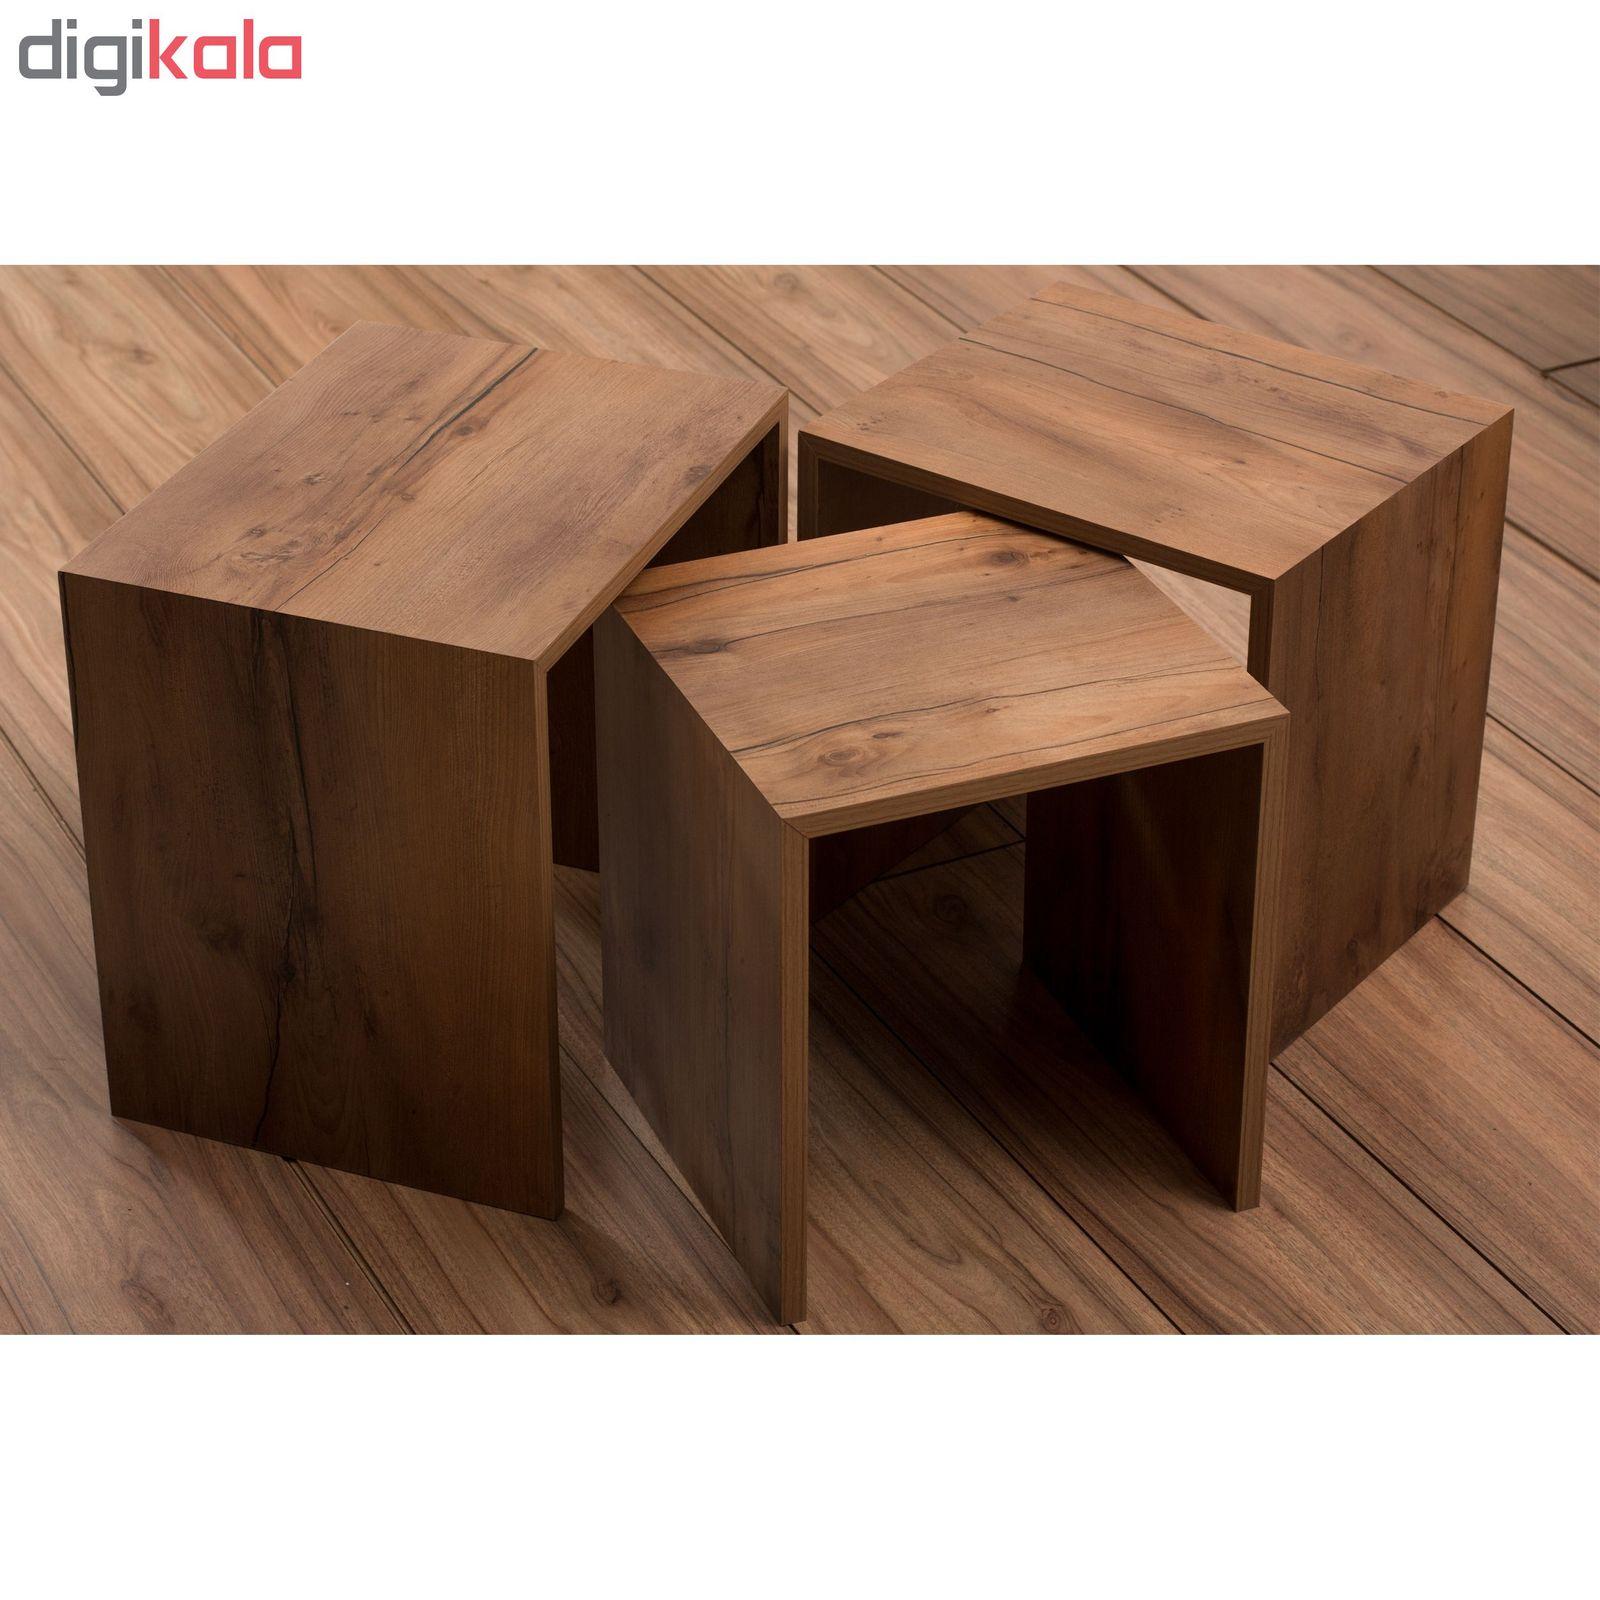 میز عسلی مدل ST1 مجموعه 3 عددی main 1 4